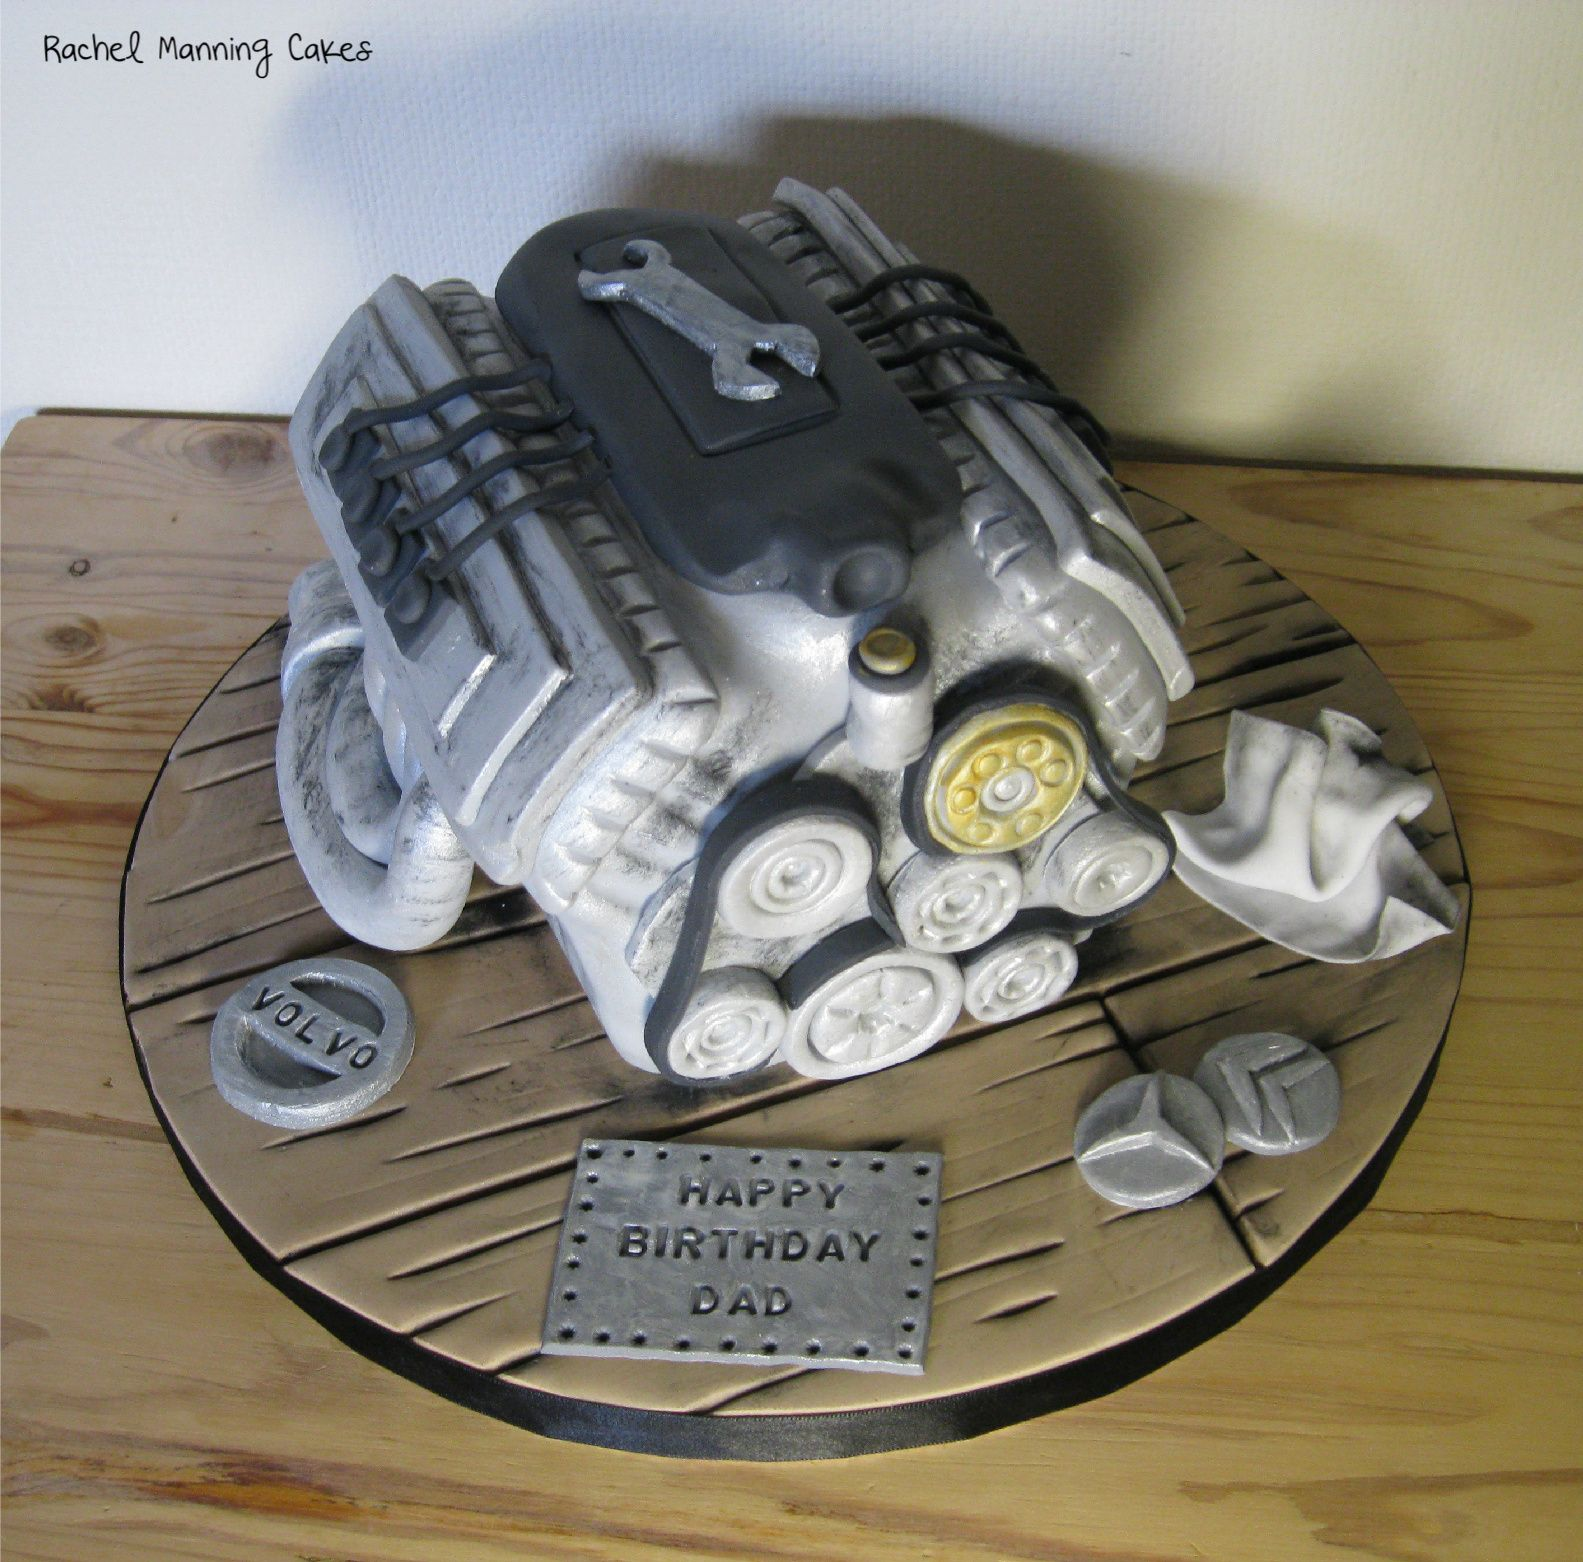 Car Engine Cake Cakes Pinterest Car Engine Engine And Cake - Car engine birthday cake